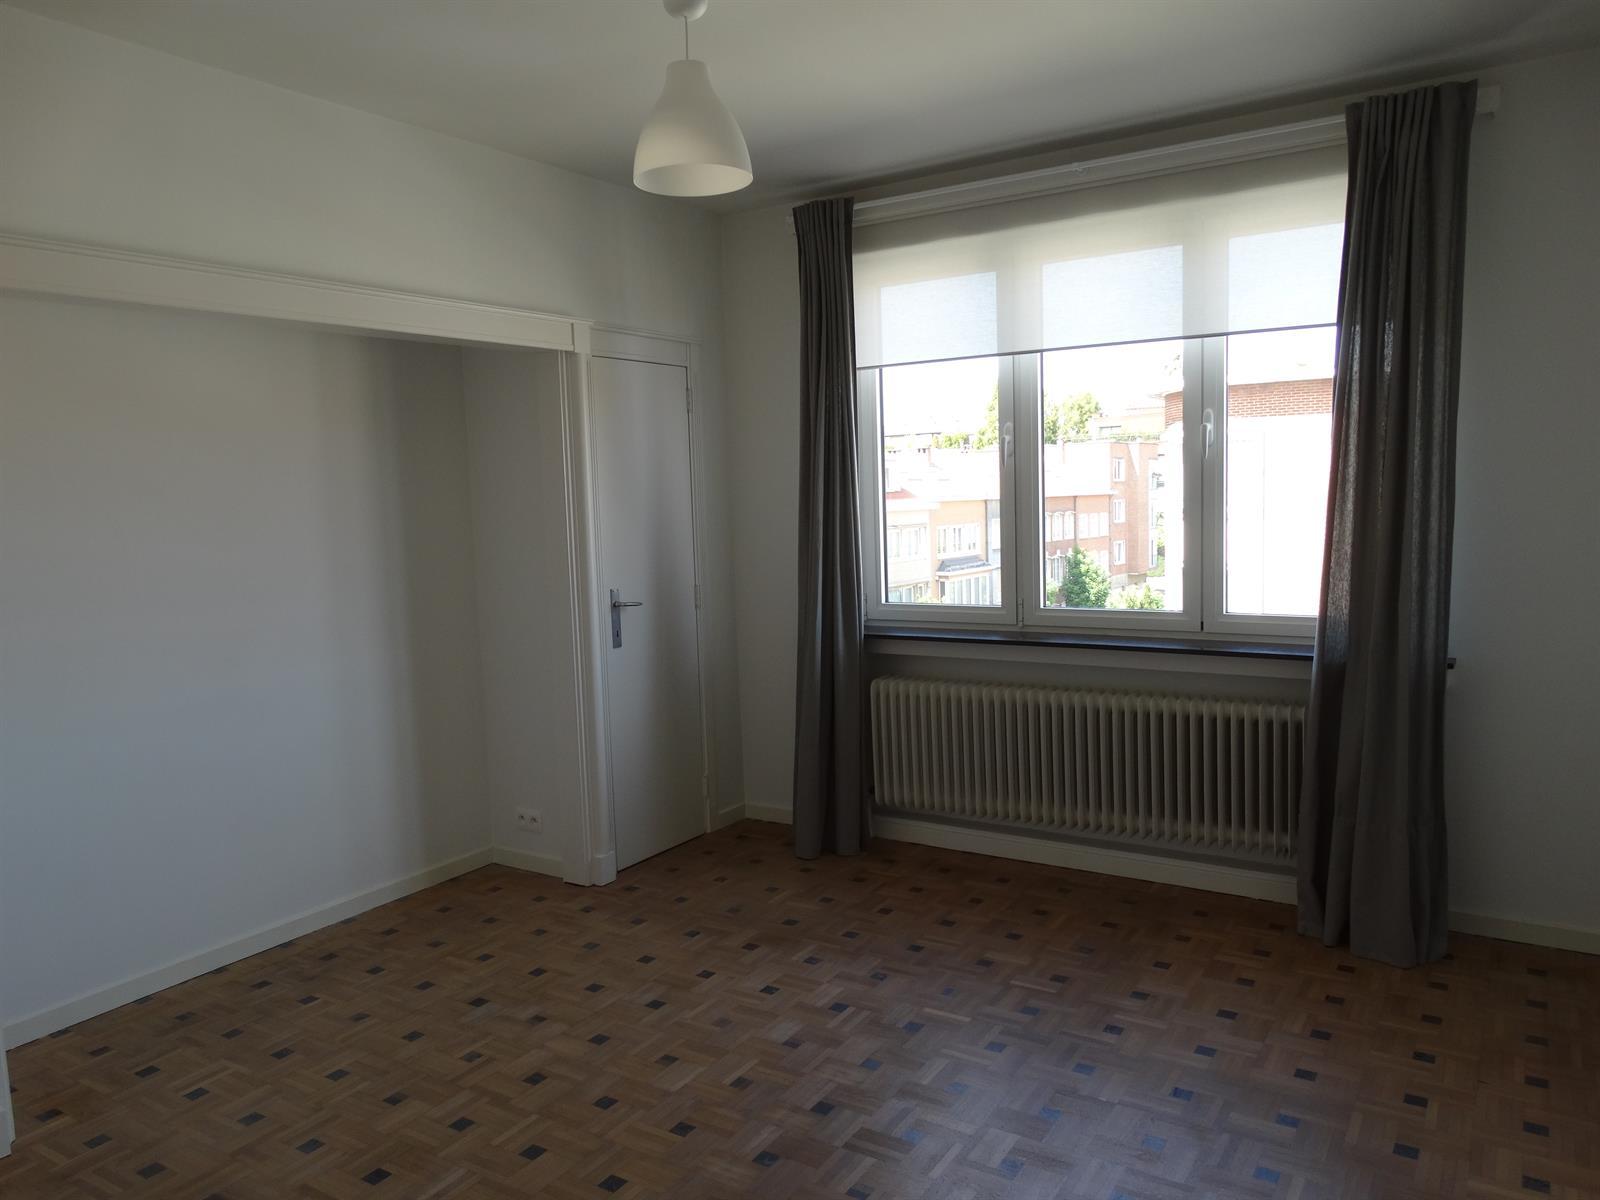 Appartement exceptionnel - Woluwe-Saint-Pierre - #4349832-6